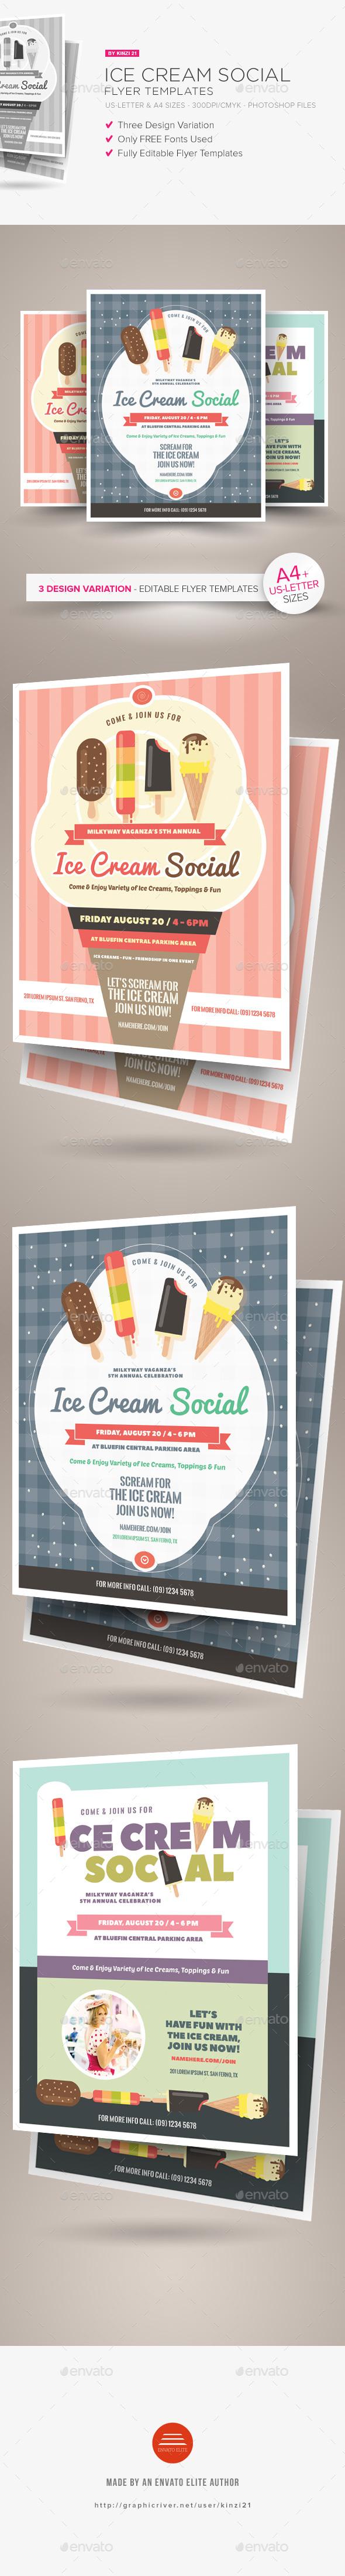 Ice Cream Social Flyer Templates by kinzi21 | GraphicRiver